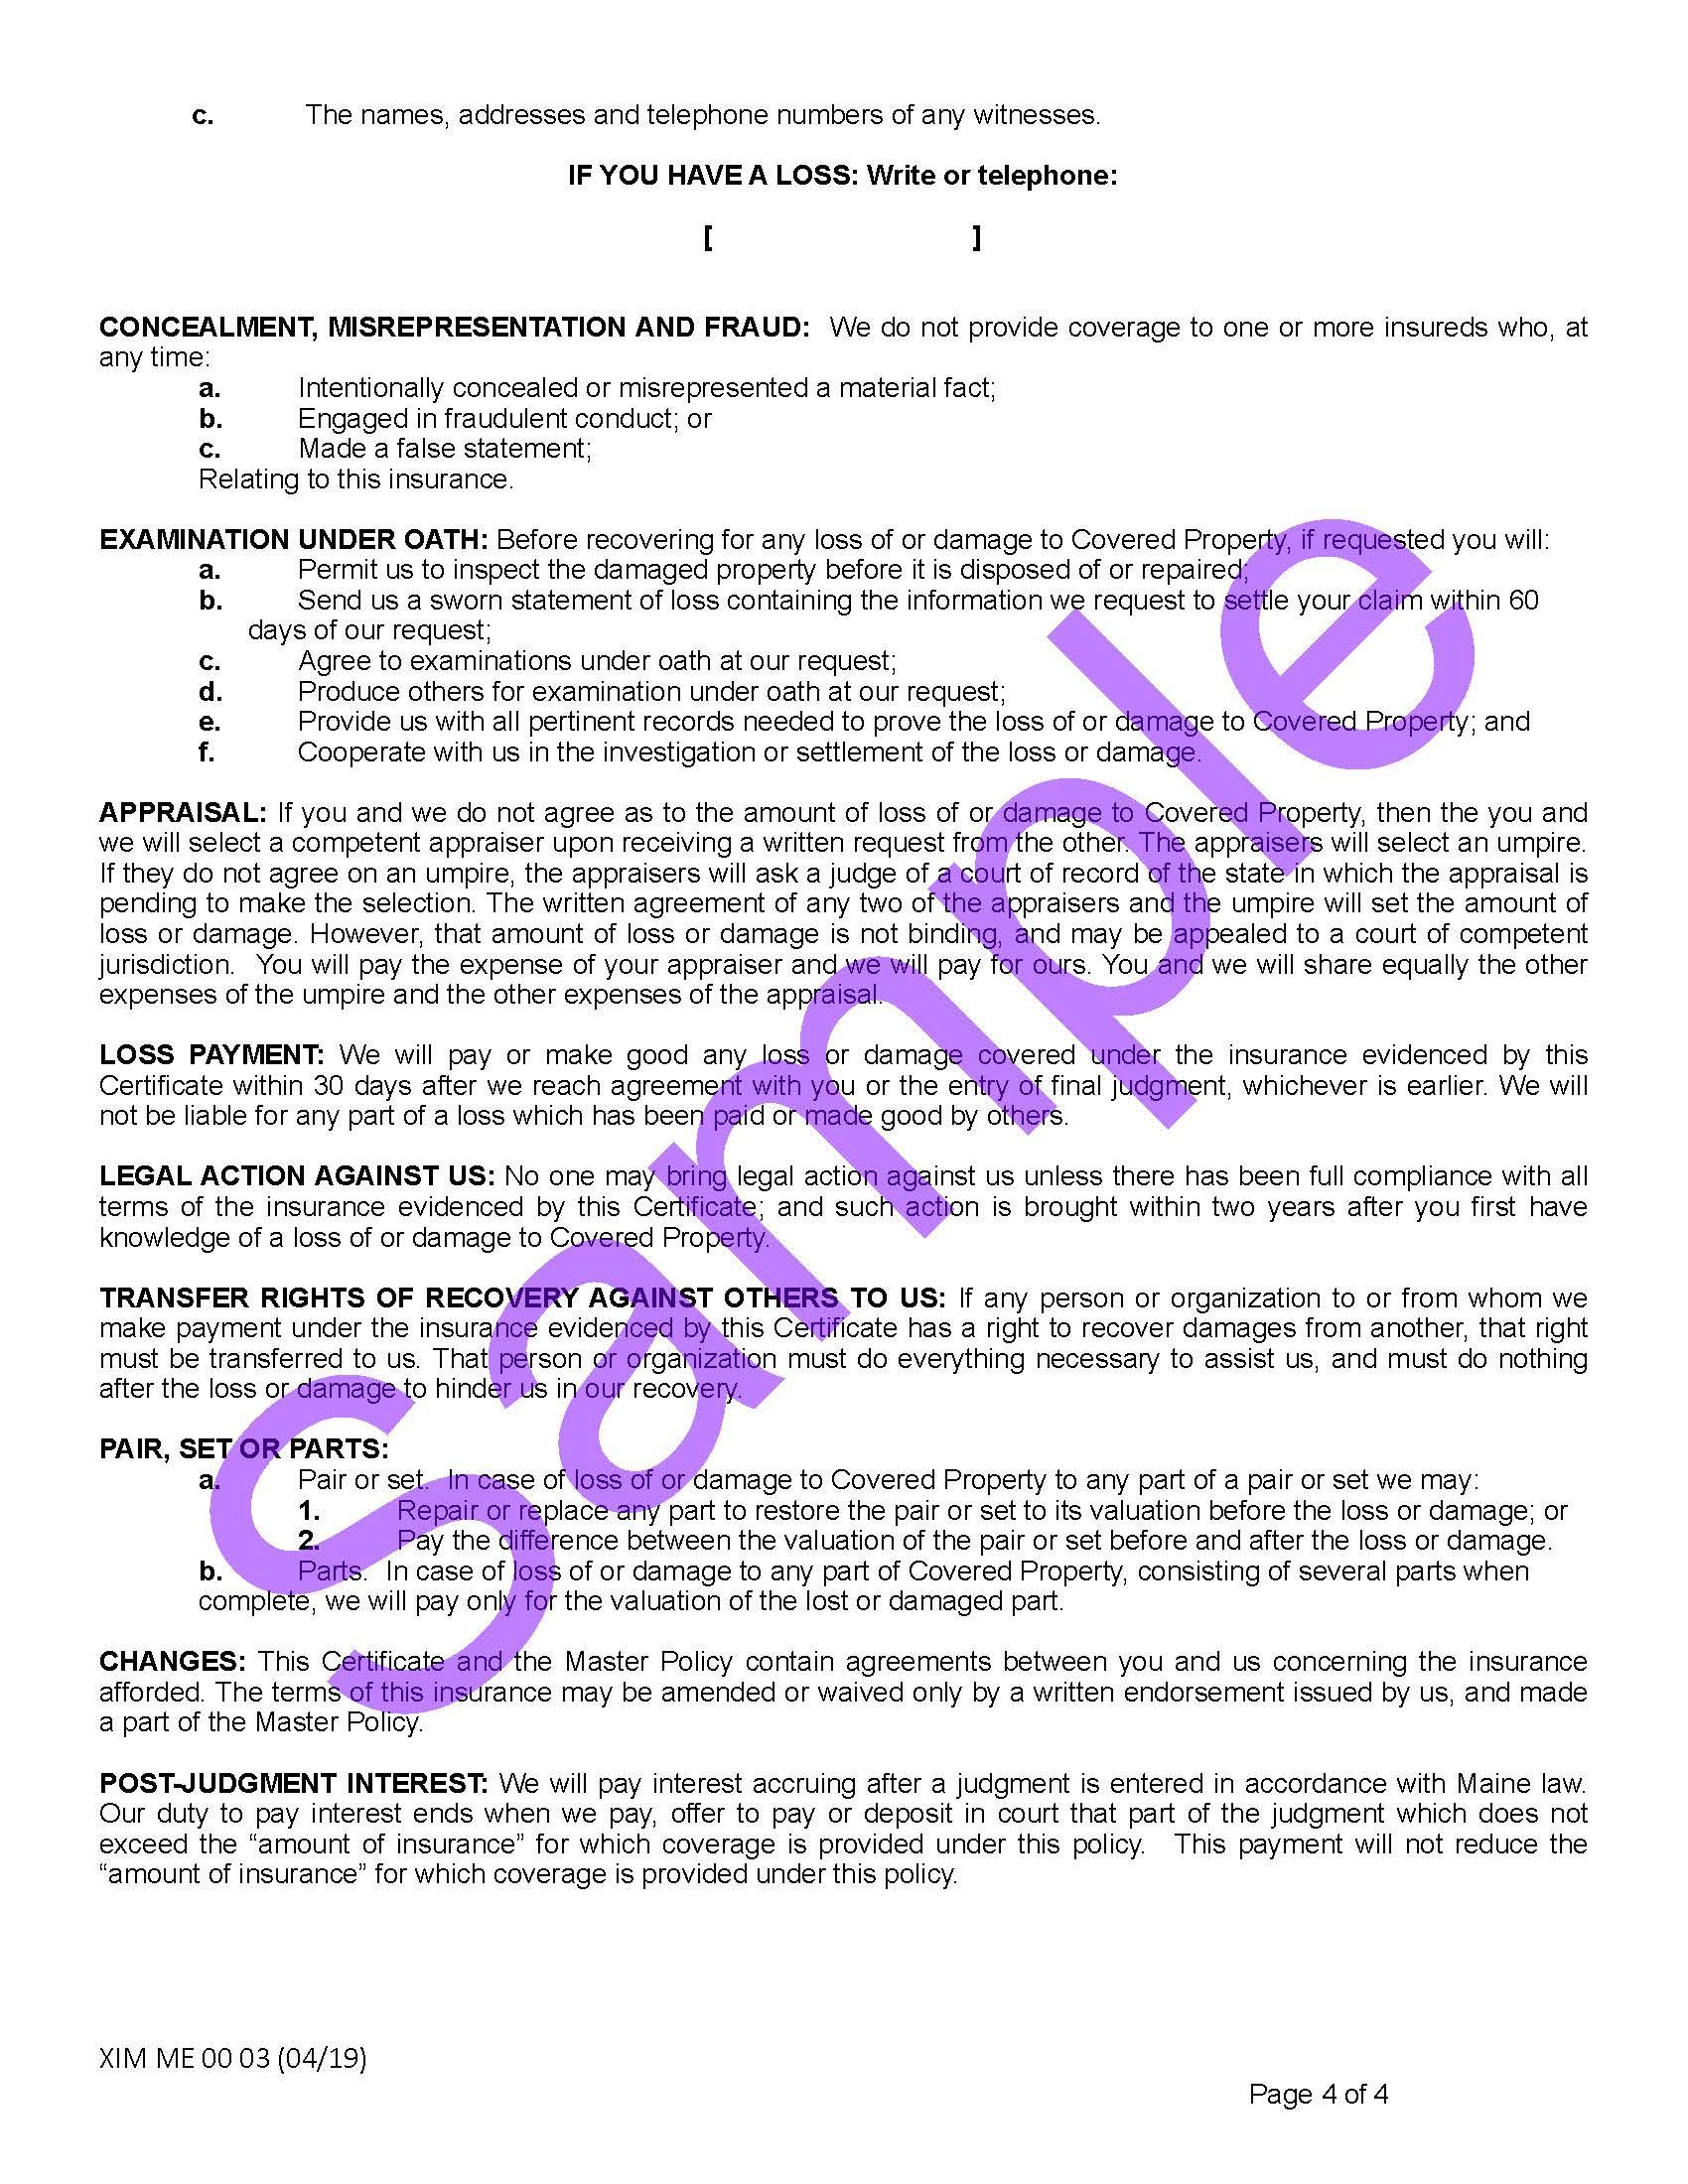 XIM ME 00 03 04 19 Maine Certificate of InsuranceSample_Page_4.jpg